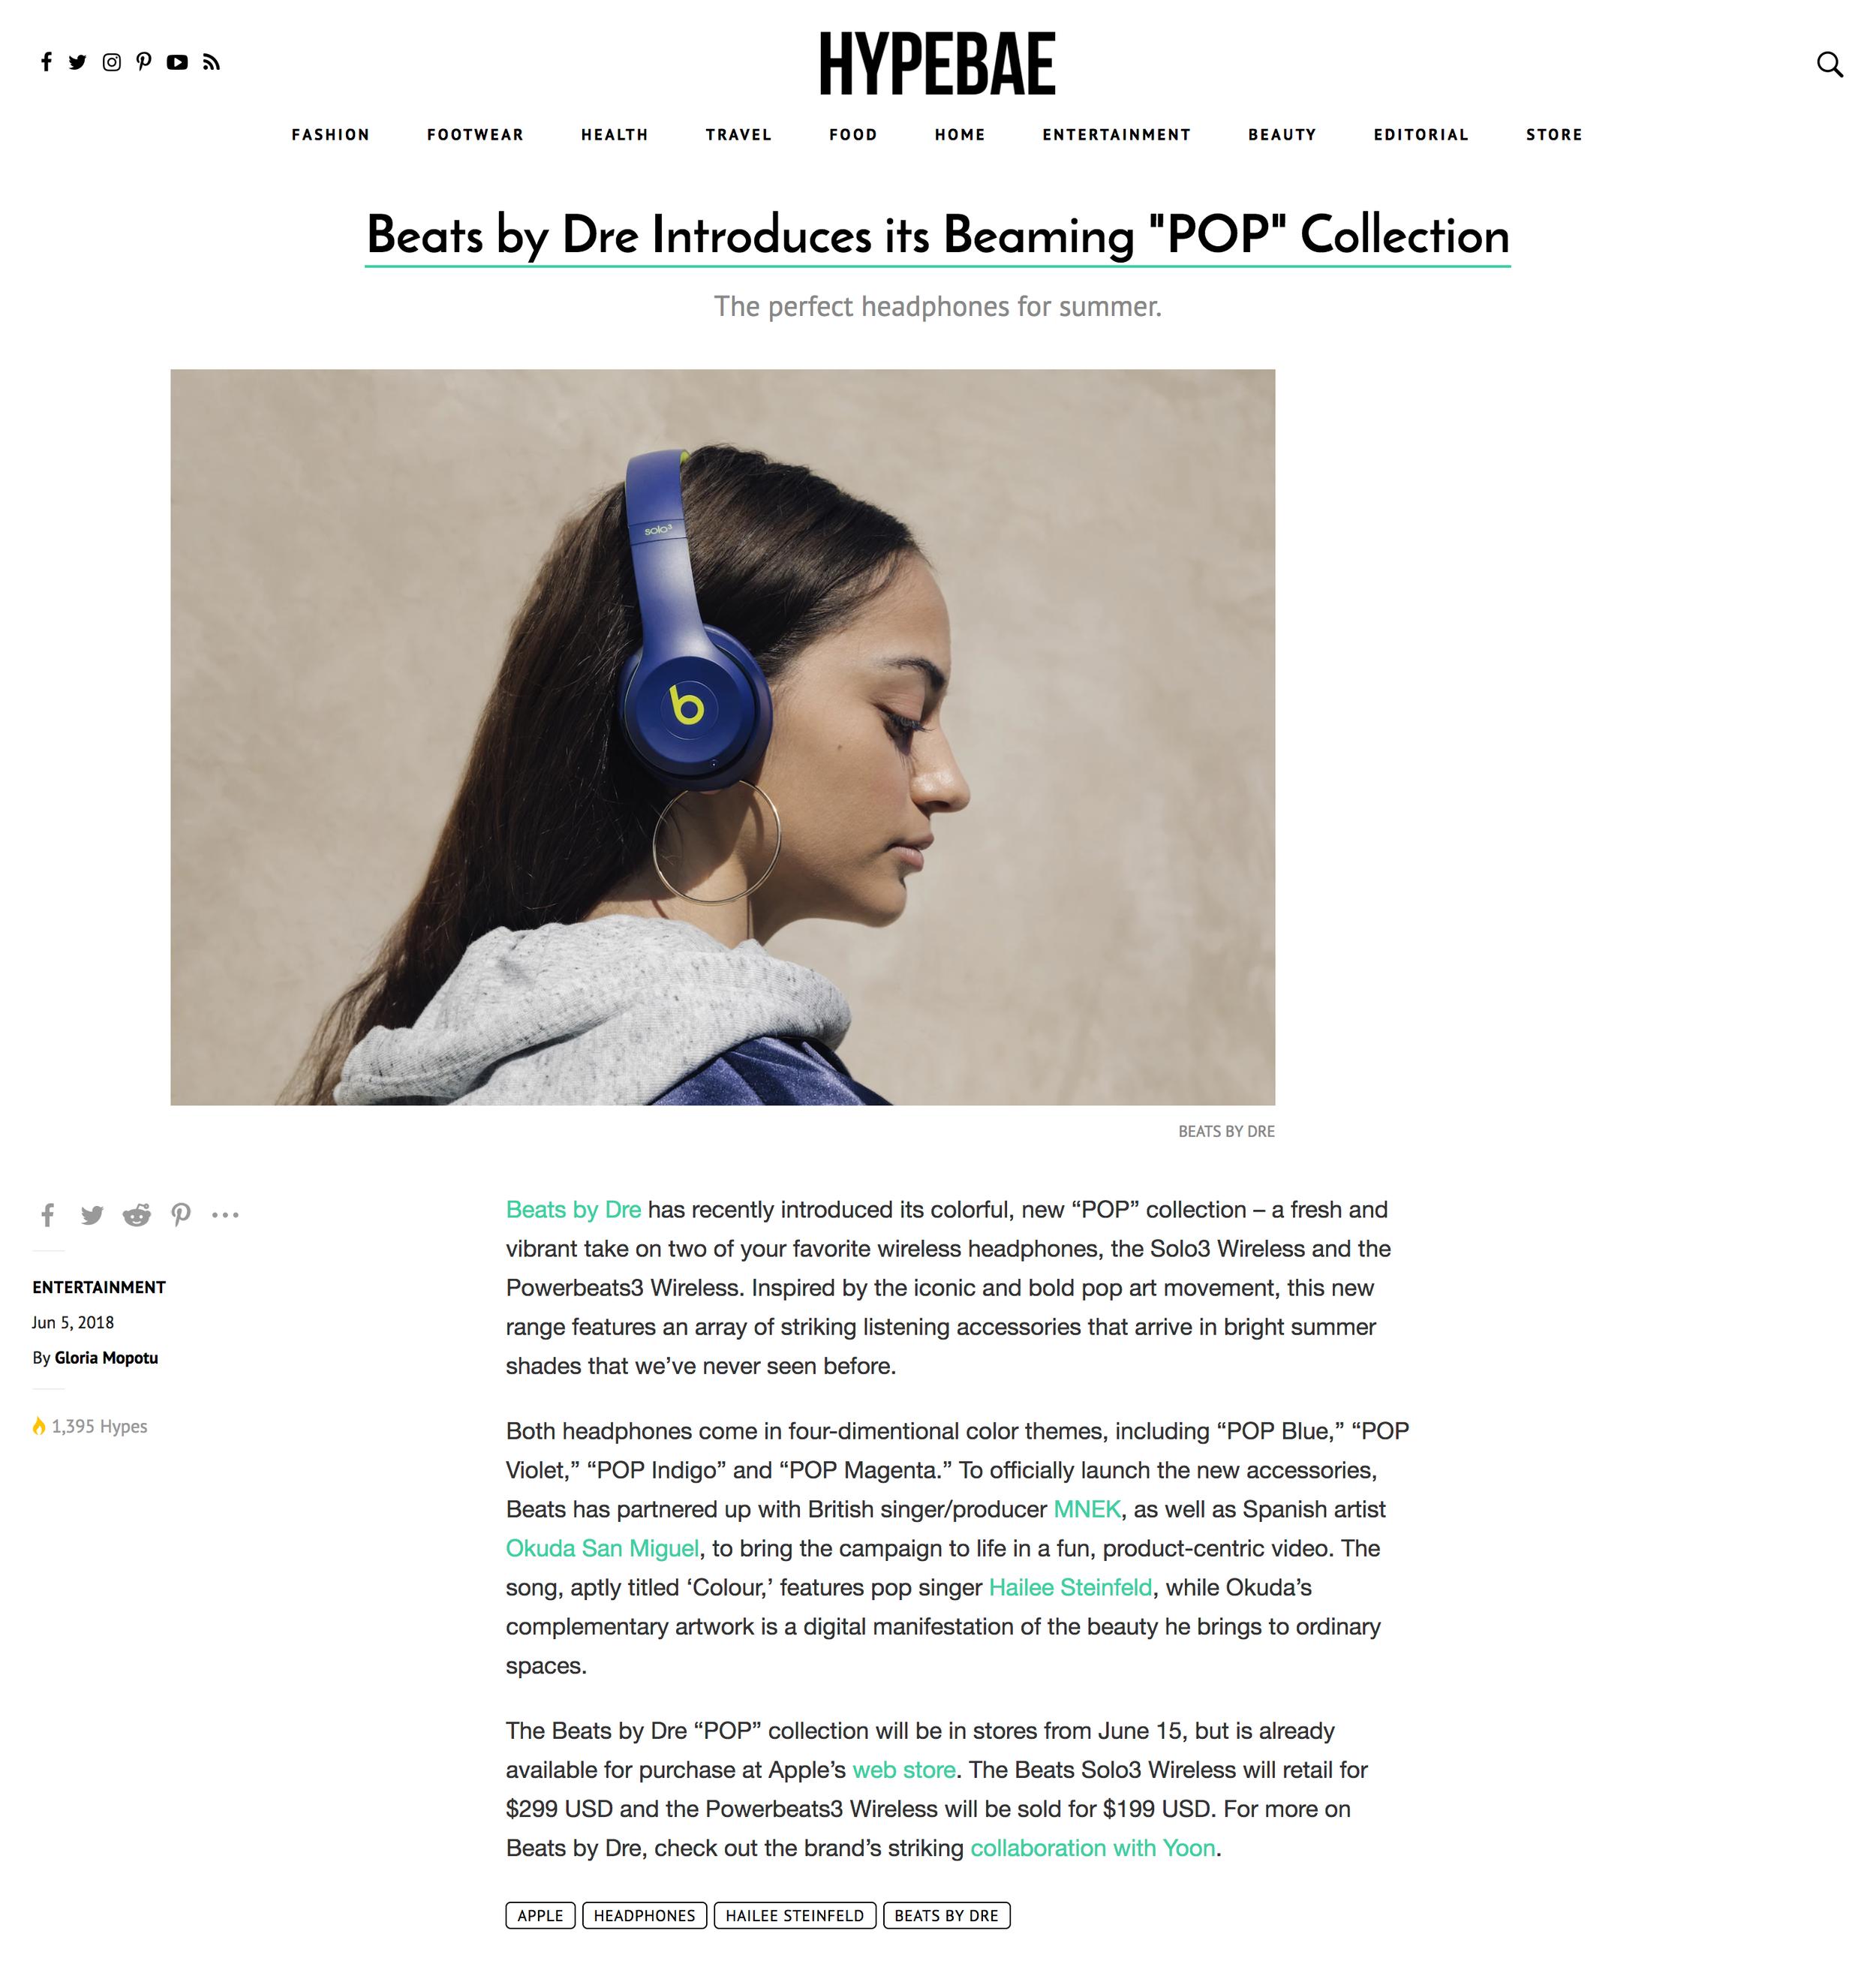 screencapture-hypebae-2018-6-beats-by-dre-pop-collection-violet-blue-magenta-indigo-2019-01-05-14_40_56 copy.png